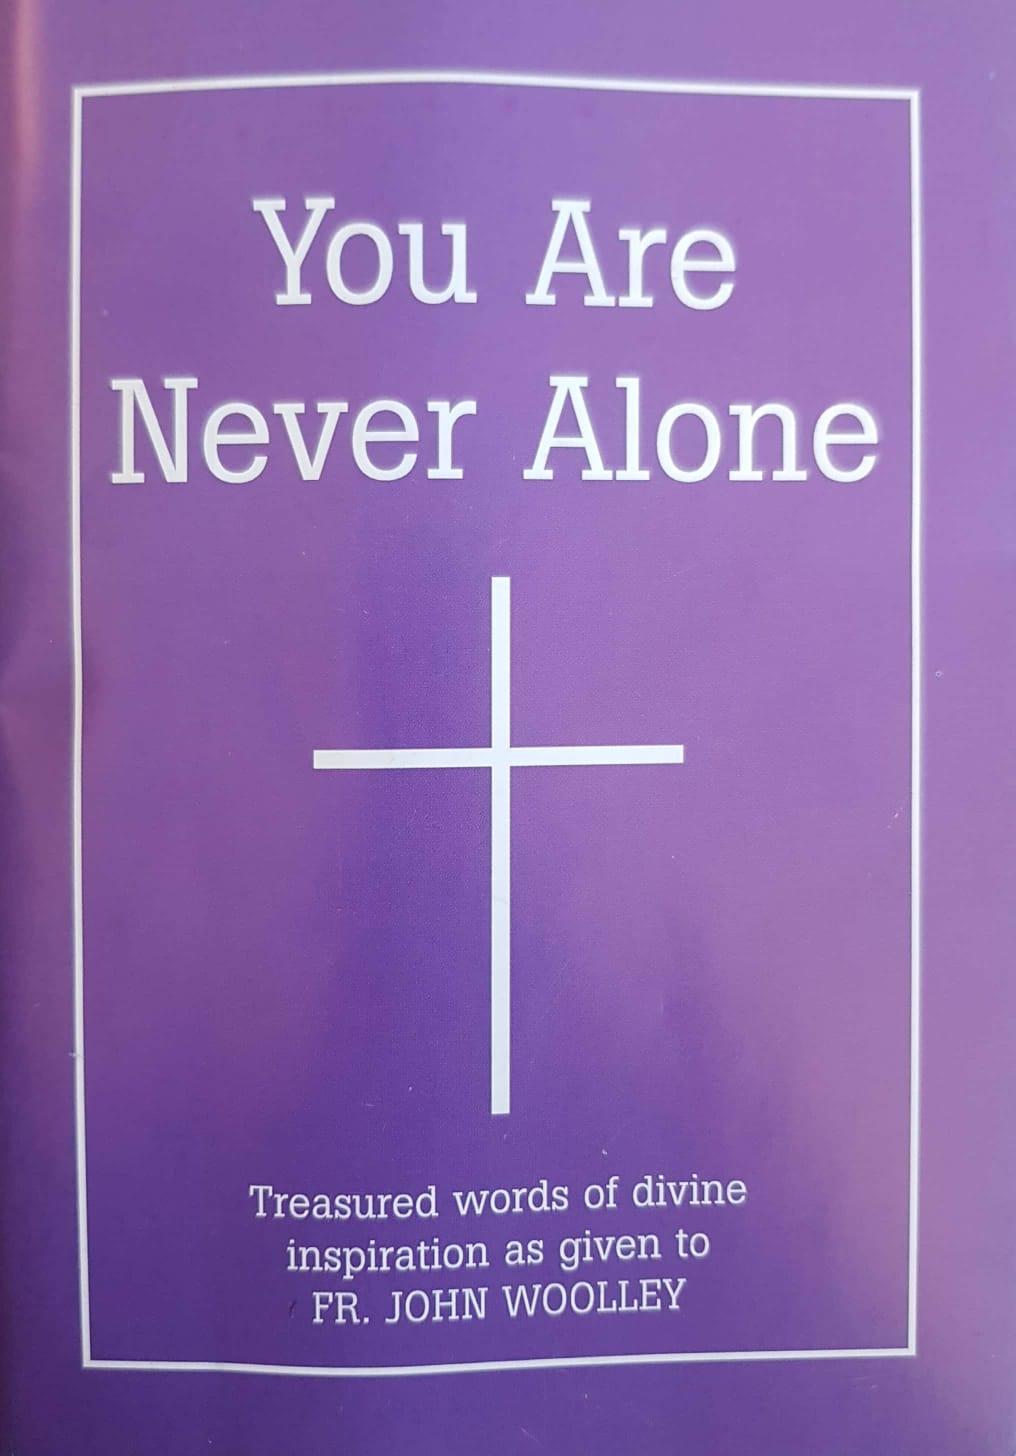 You Are Never Alone - Free Mini Edition